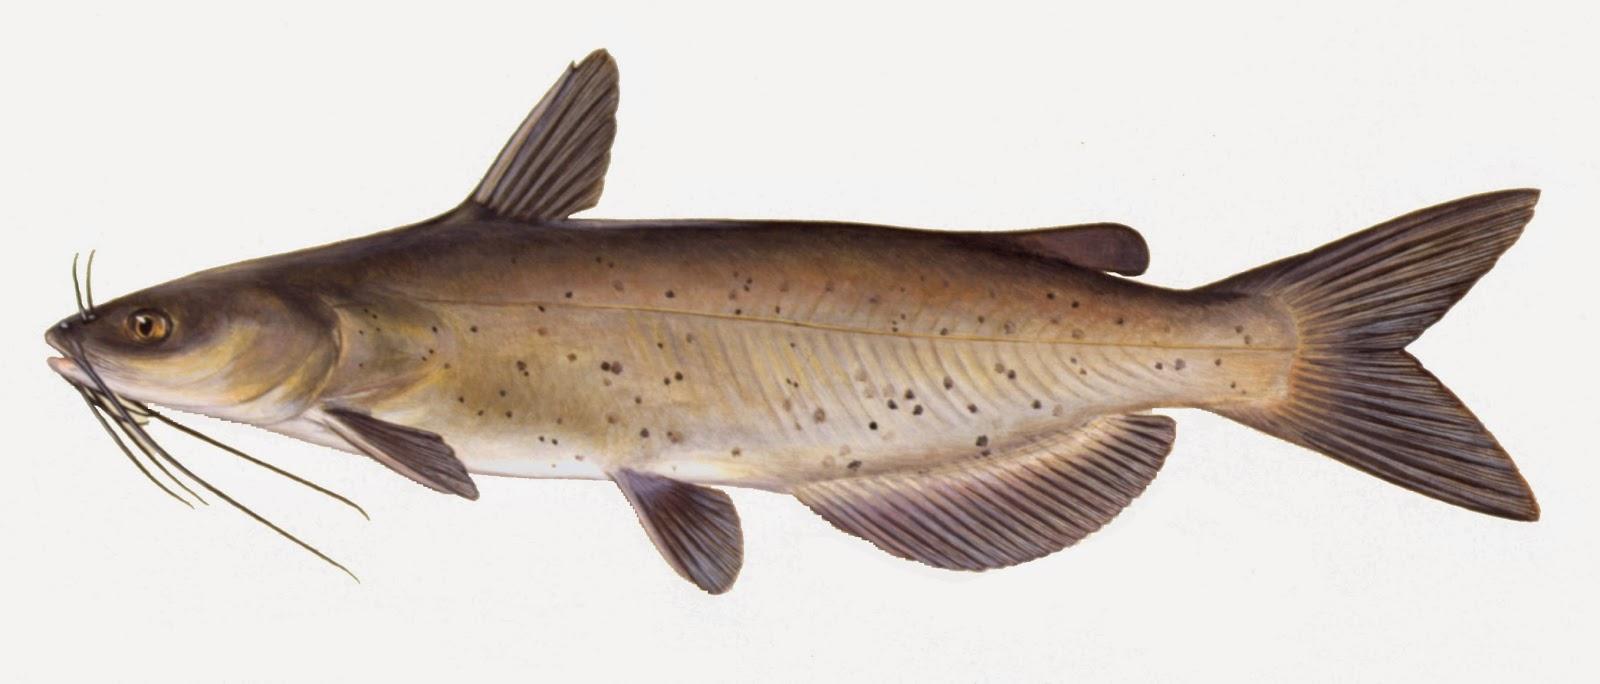 Take it outside fish iowa iowa fish species catfish for Outside fish